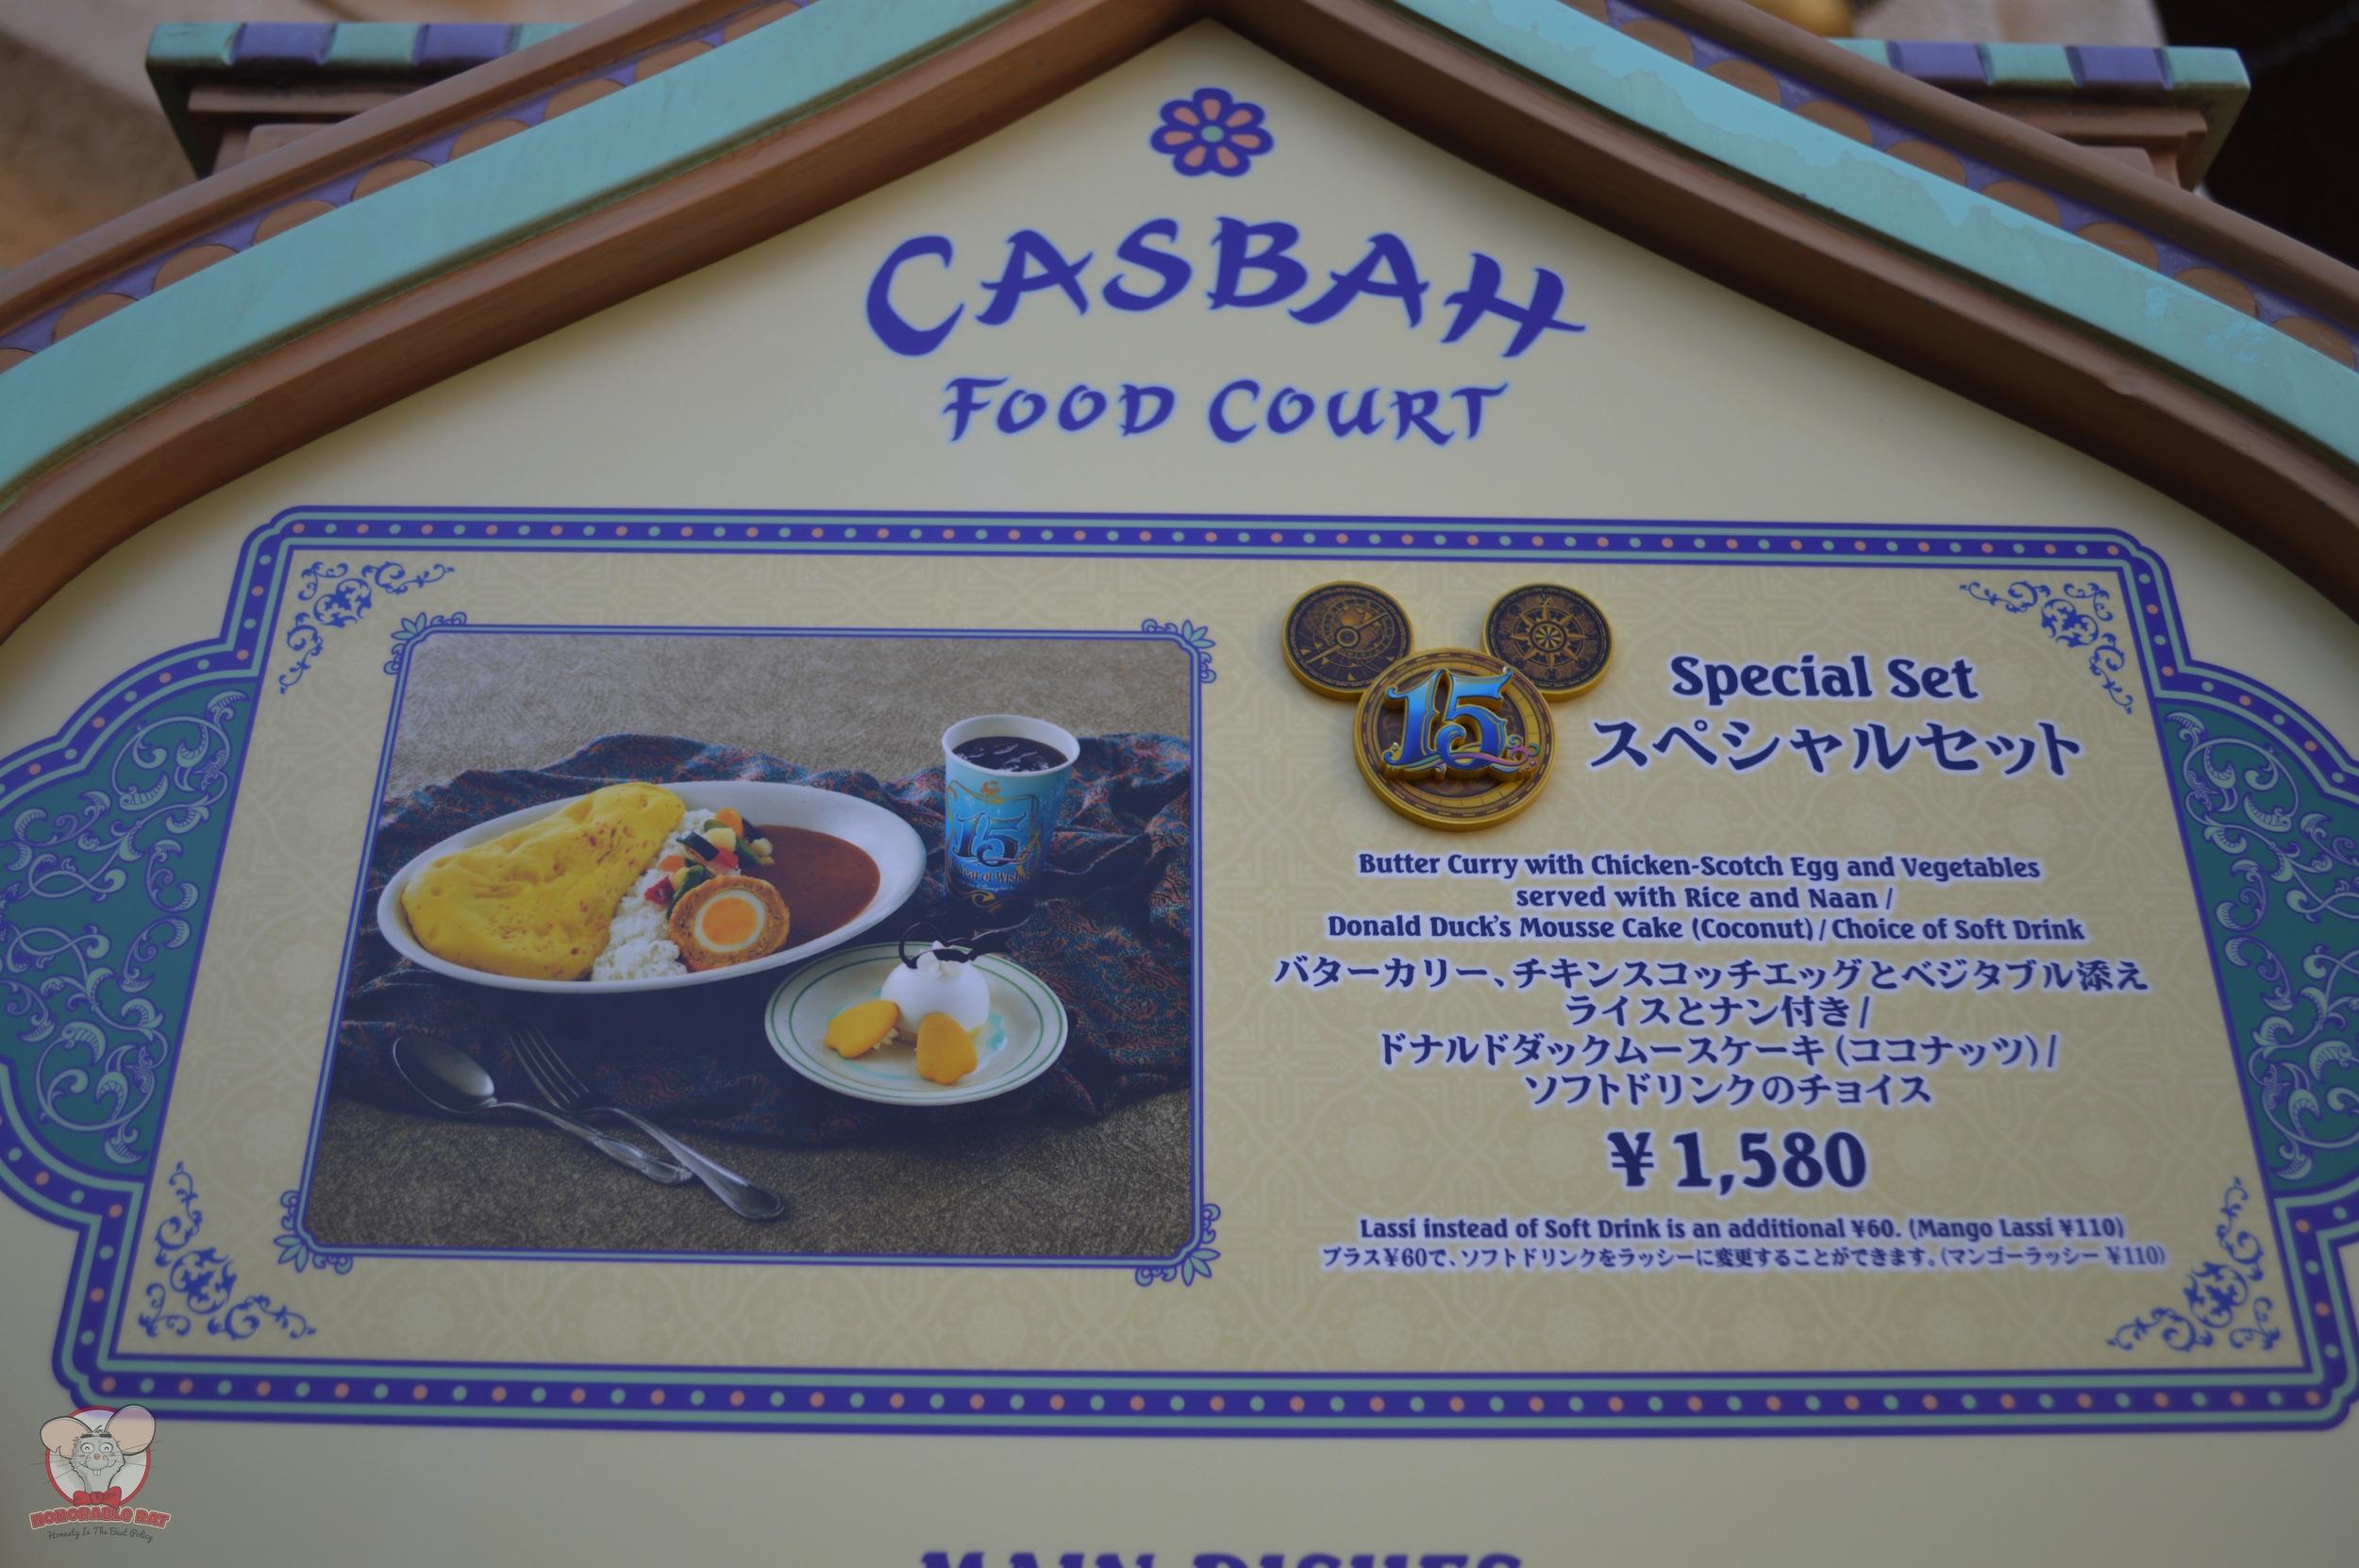 Casbah Food Court 15th Anniversary Set Menu